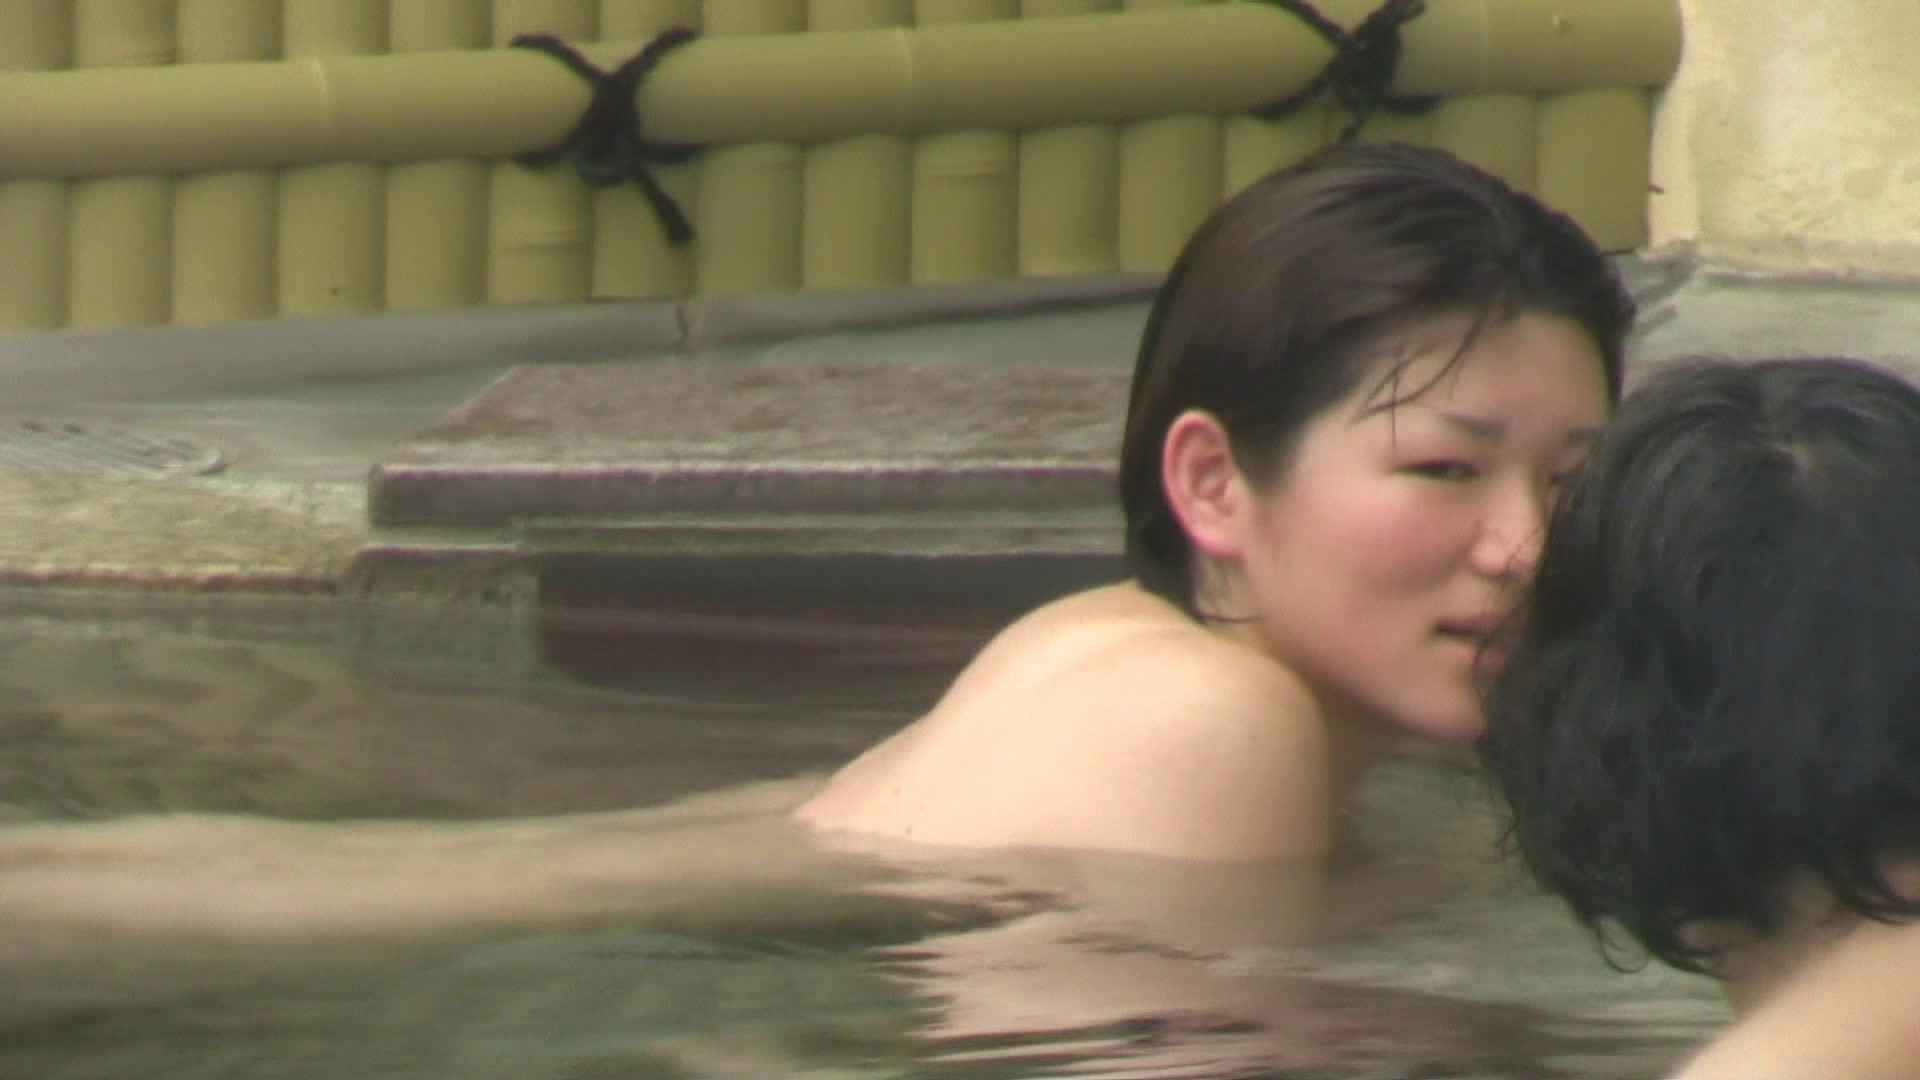 Aquaな露天風呂Vol.673 盗撮 おめこ無修正画像 45連発 5